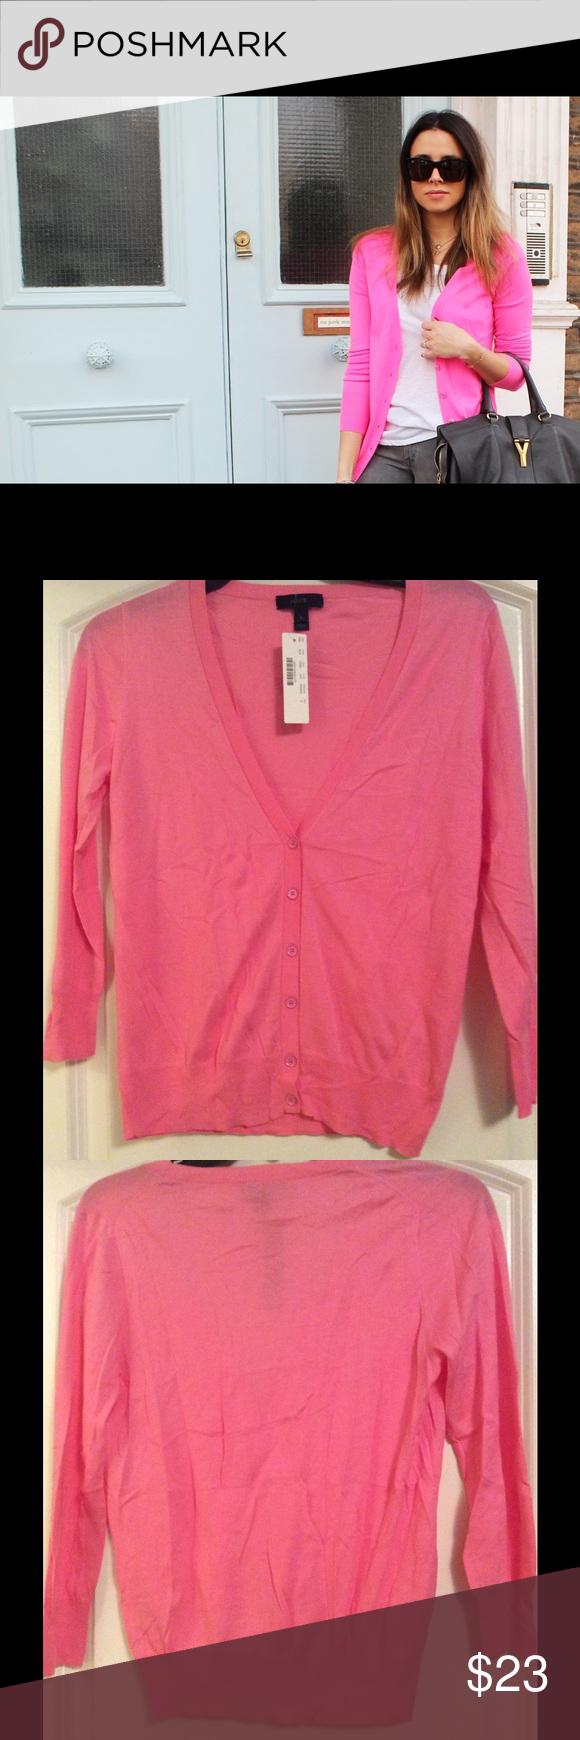 J. Crew Lightweight Spring Cardigan Size S NWT   Pink, Sweater ...